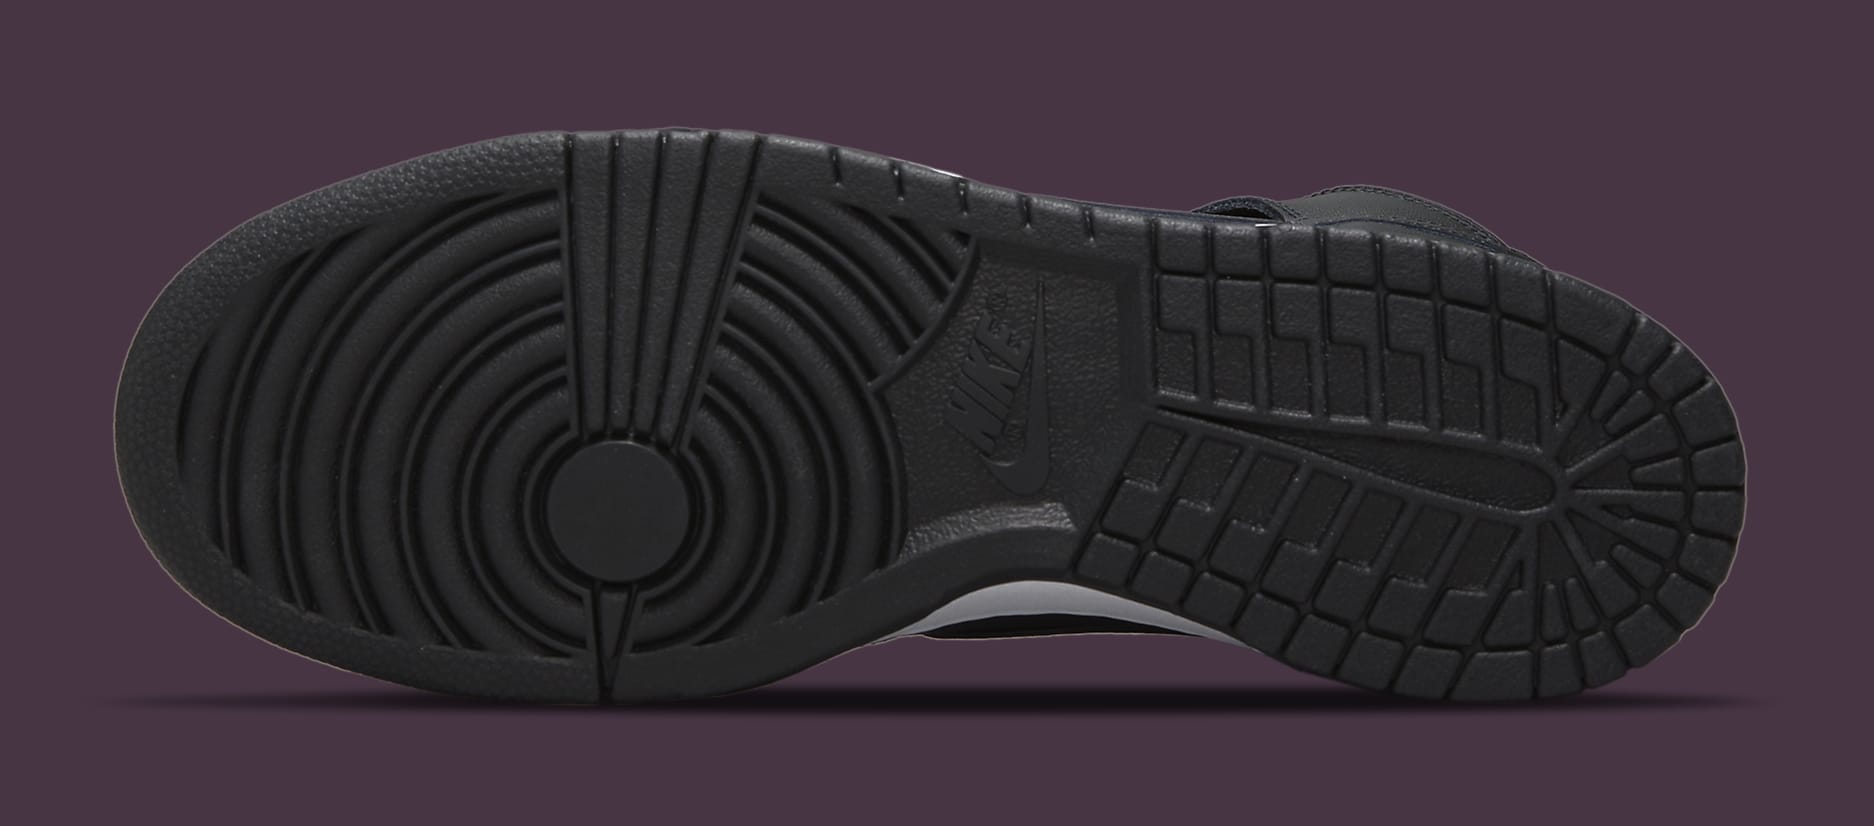 Fragment Design x Nike Dunk High 'Black' DJ0382-600 Outsole